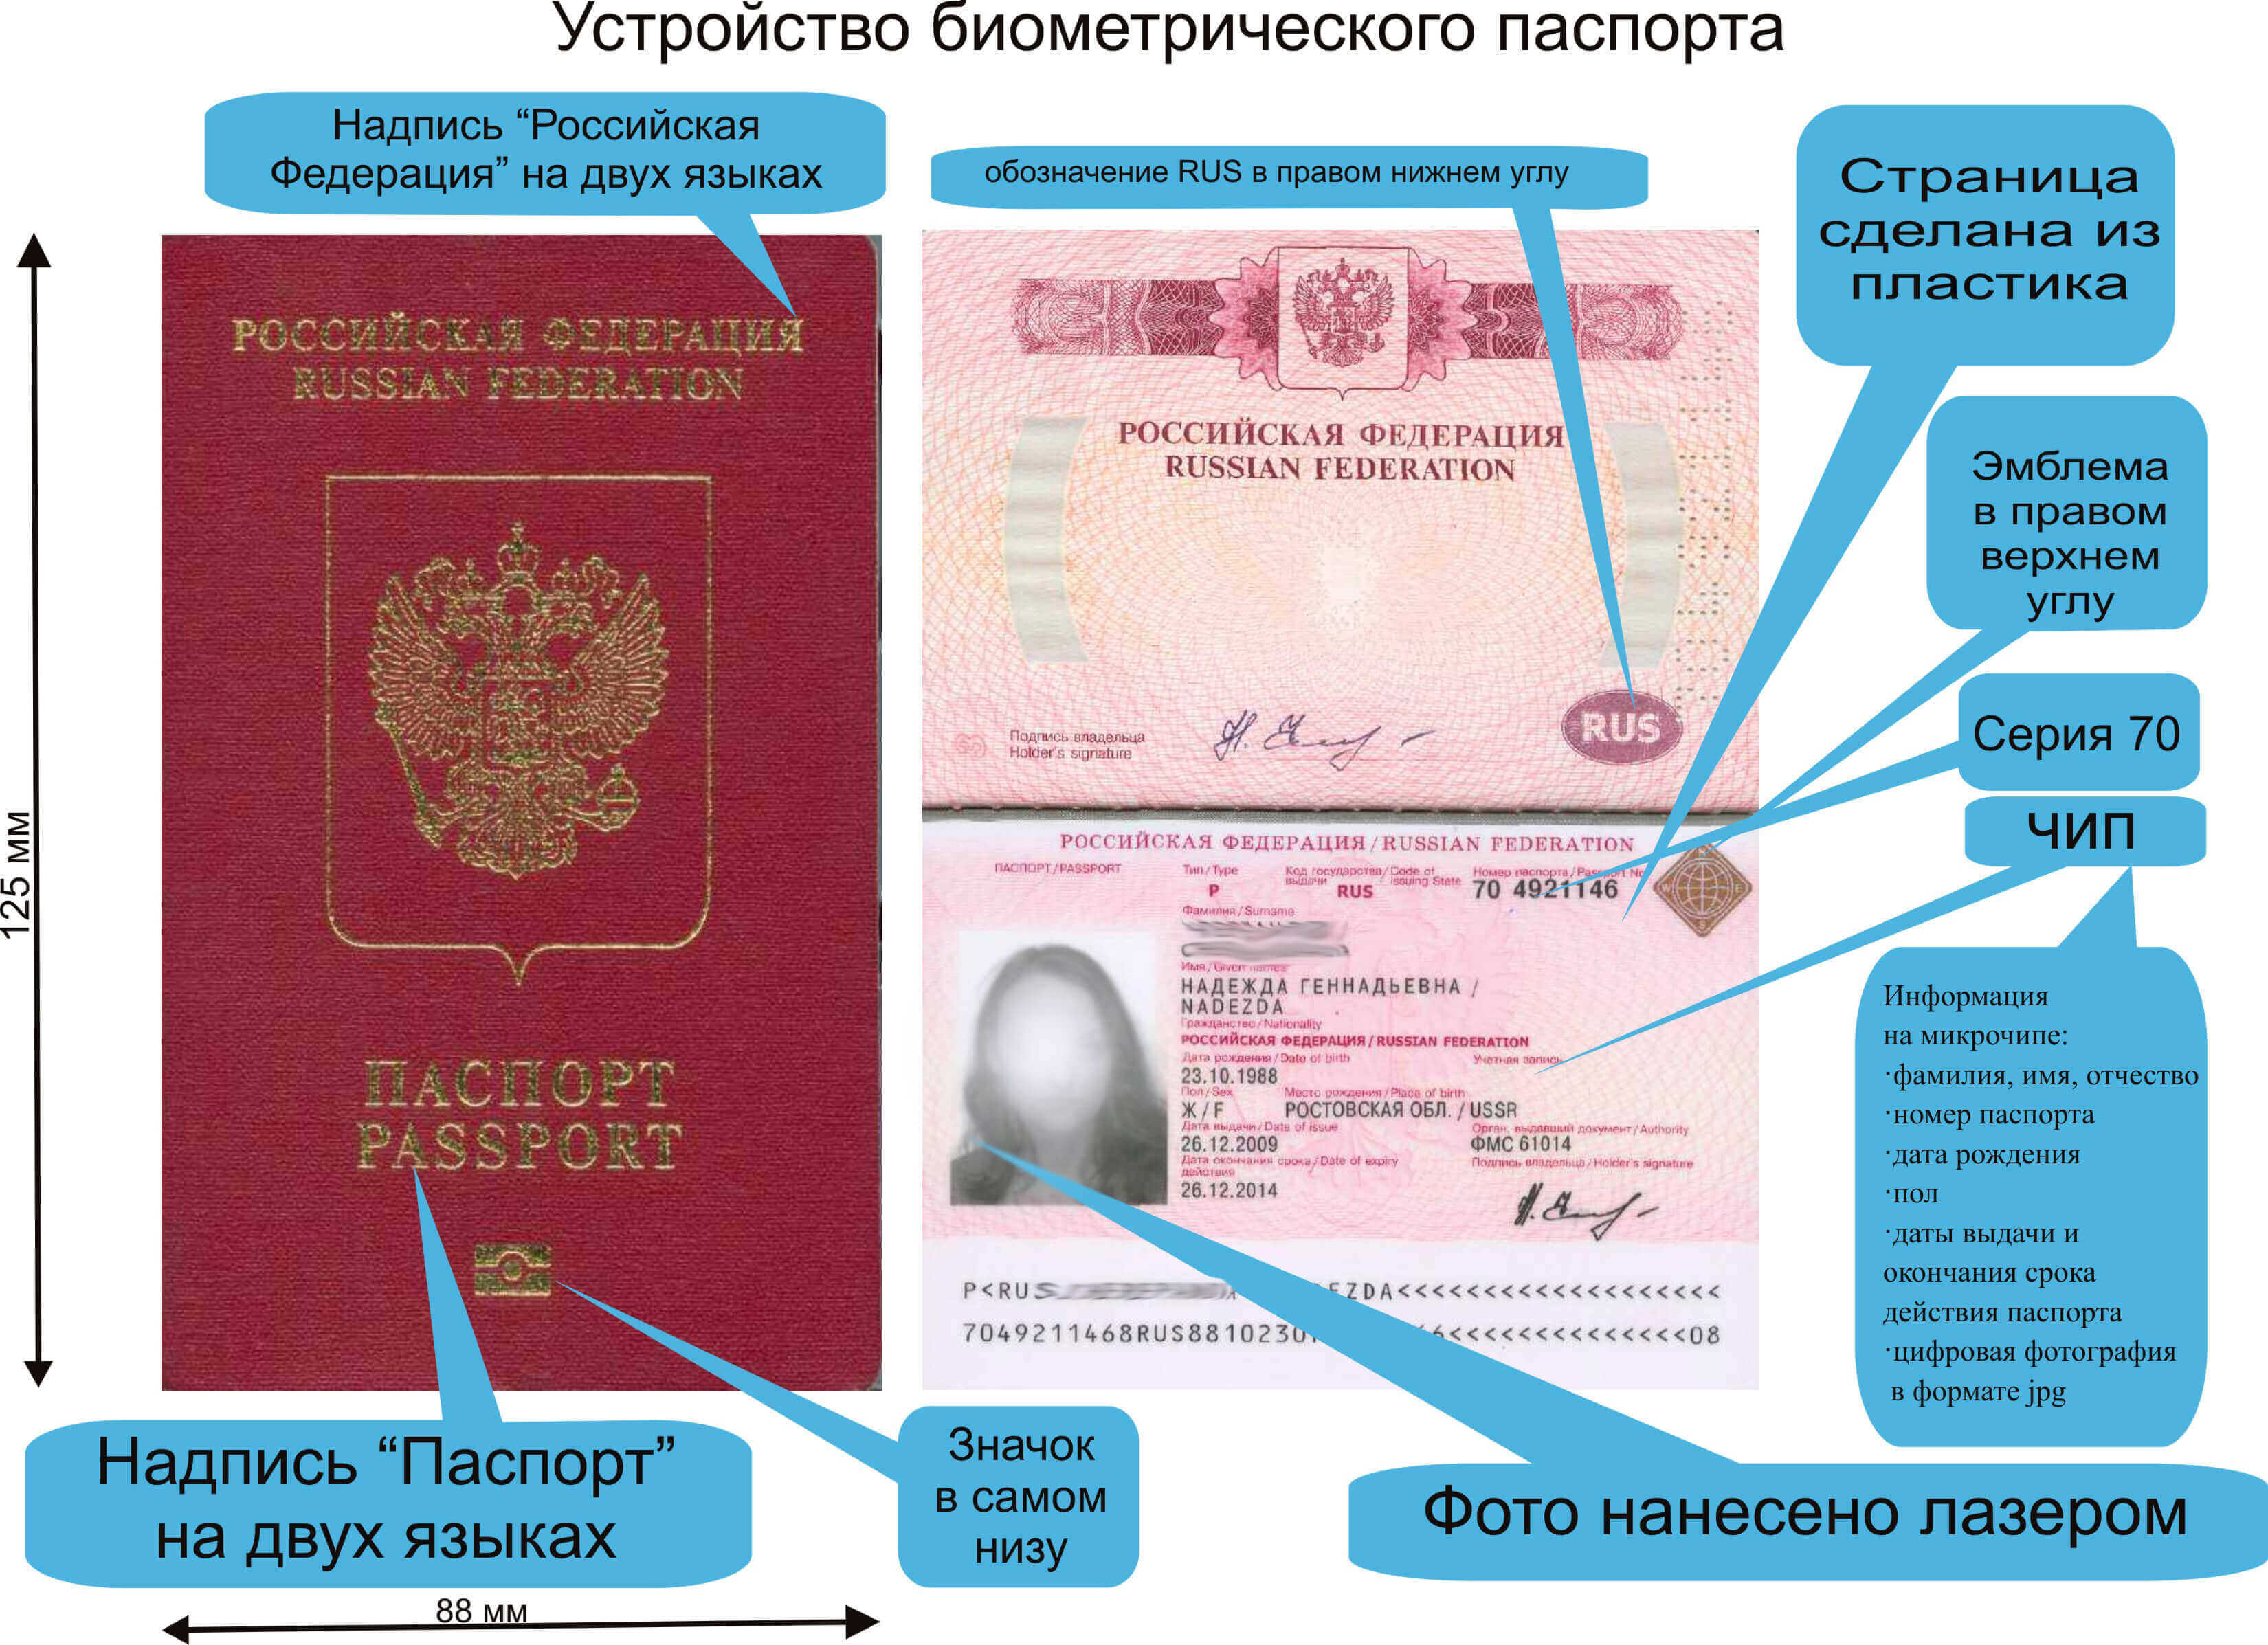 бланк на паспорт 14 лет